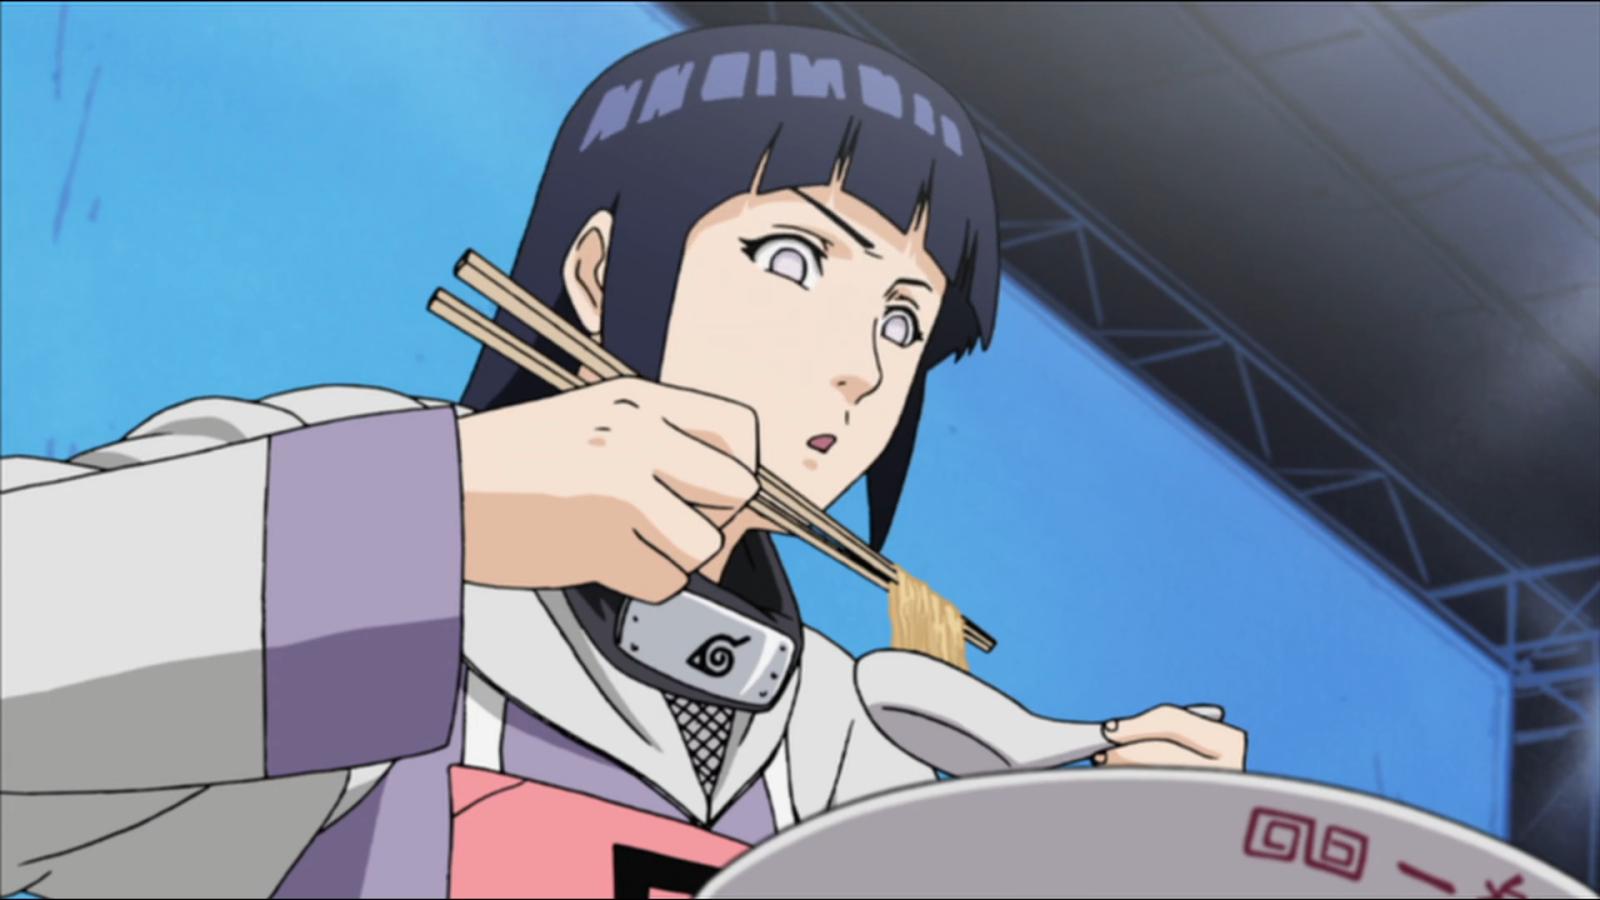 Crunchyroll - The 5 Greatest Ramen Battles in Anime